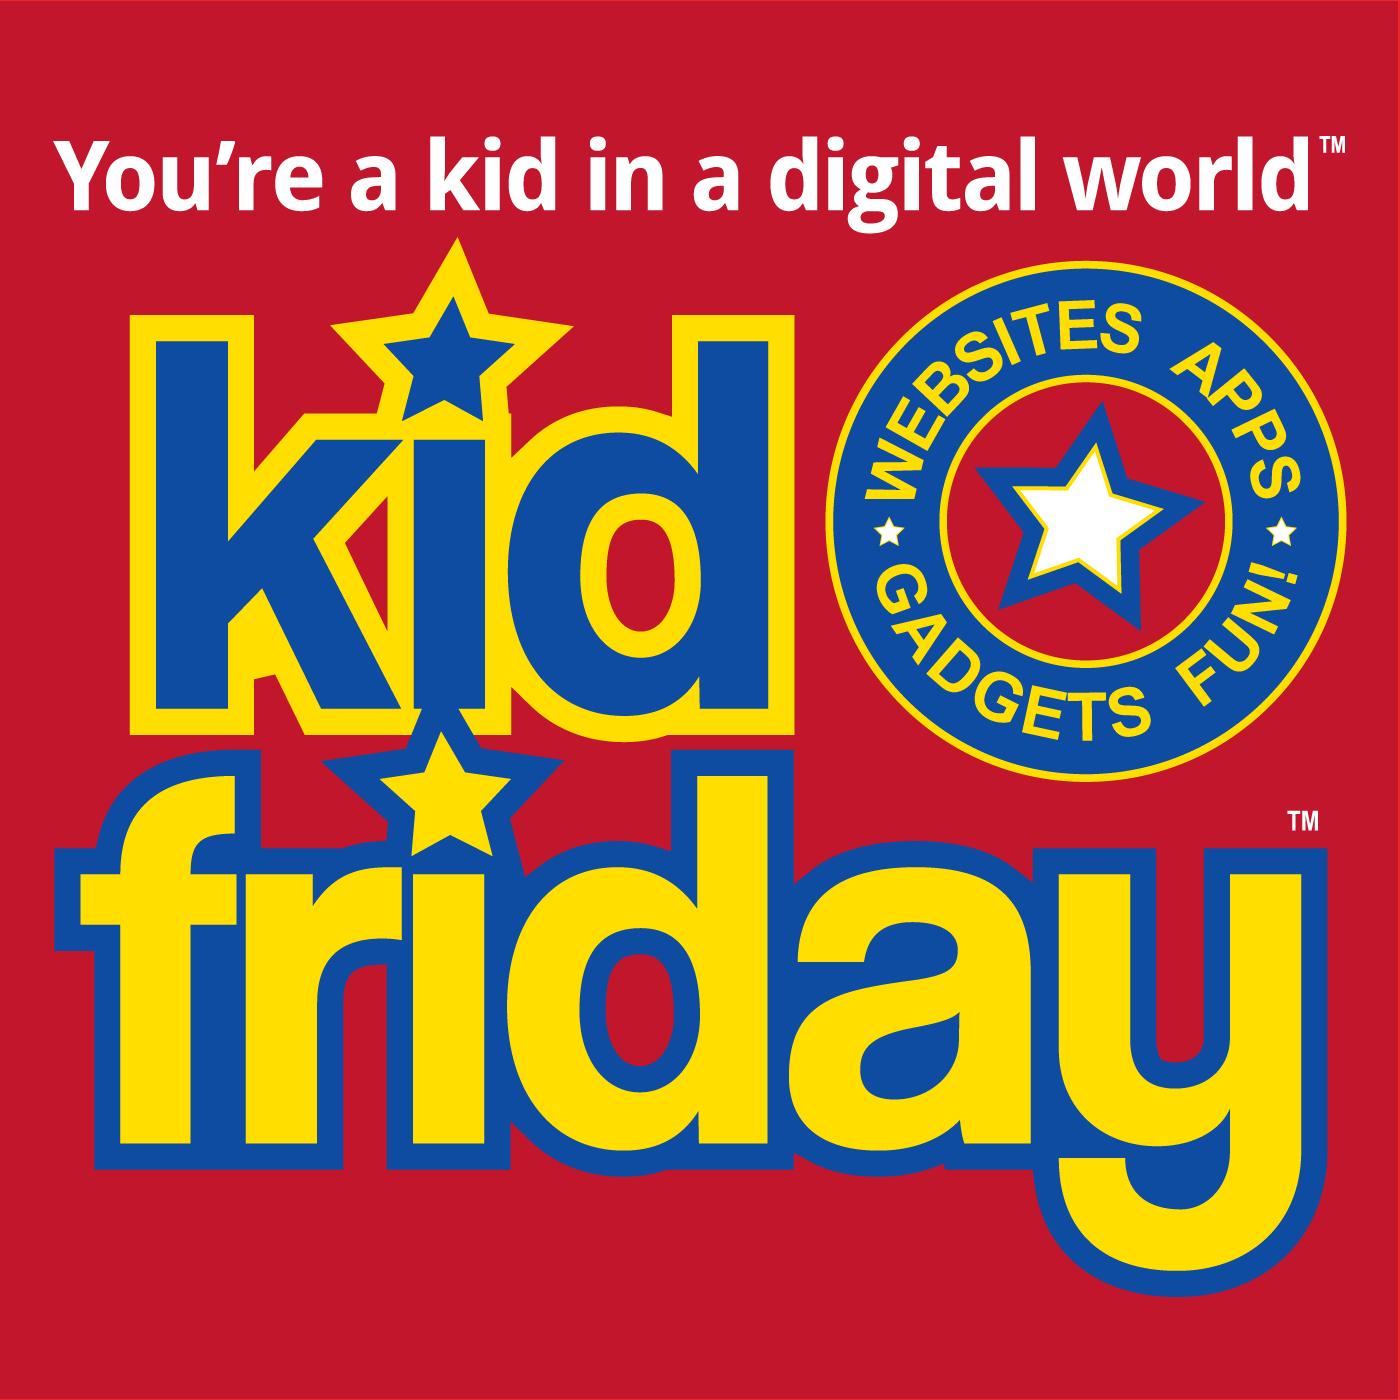 Kid Friday - apps, websites, gadgets, games, fun!